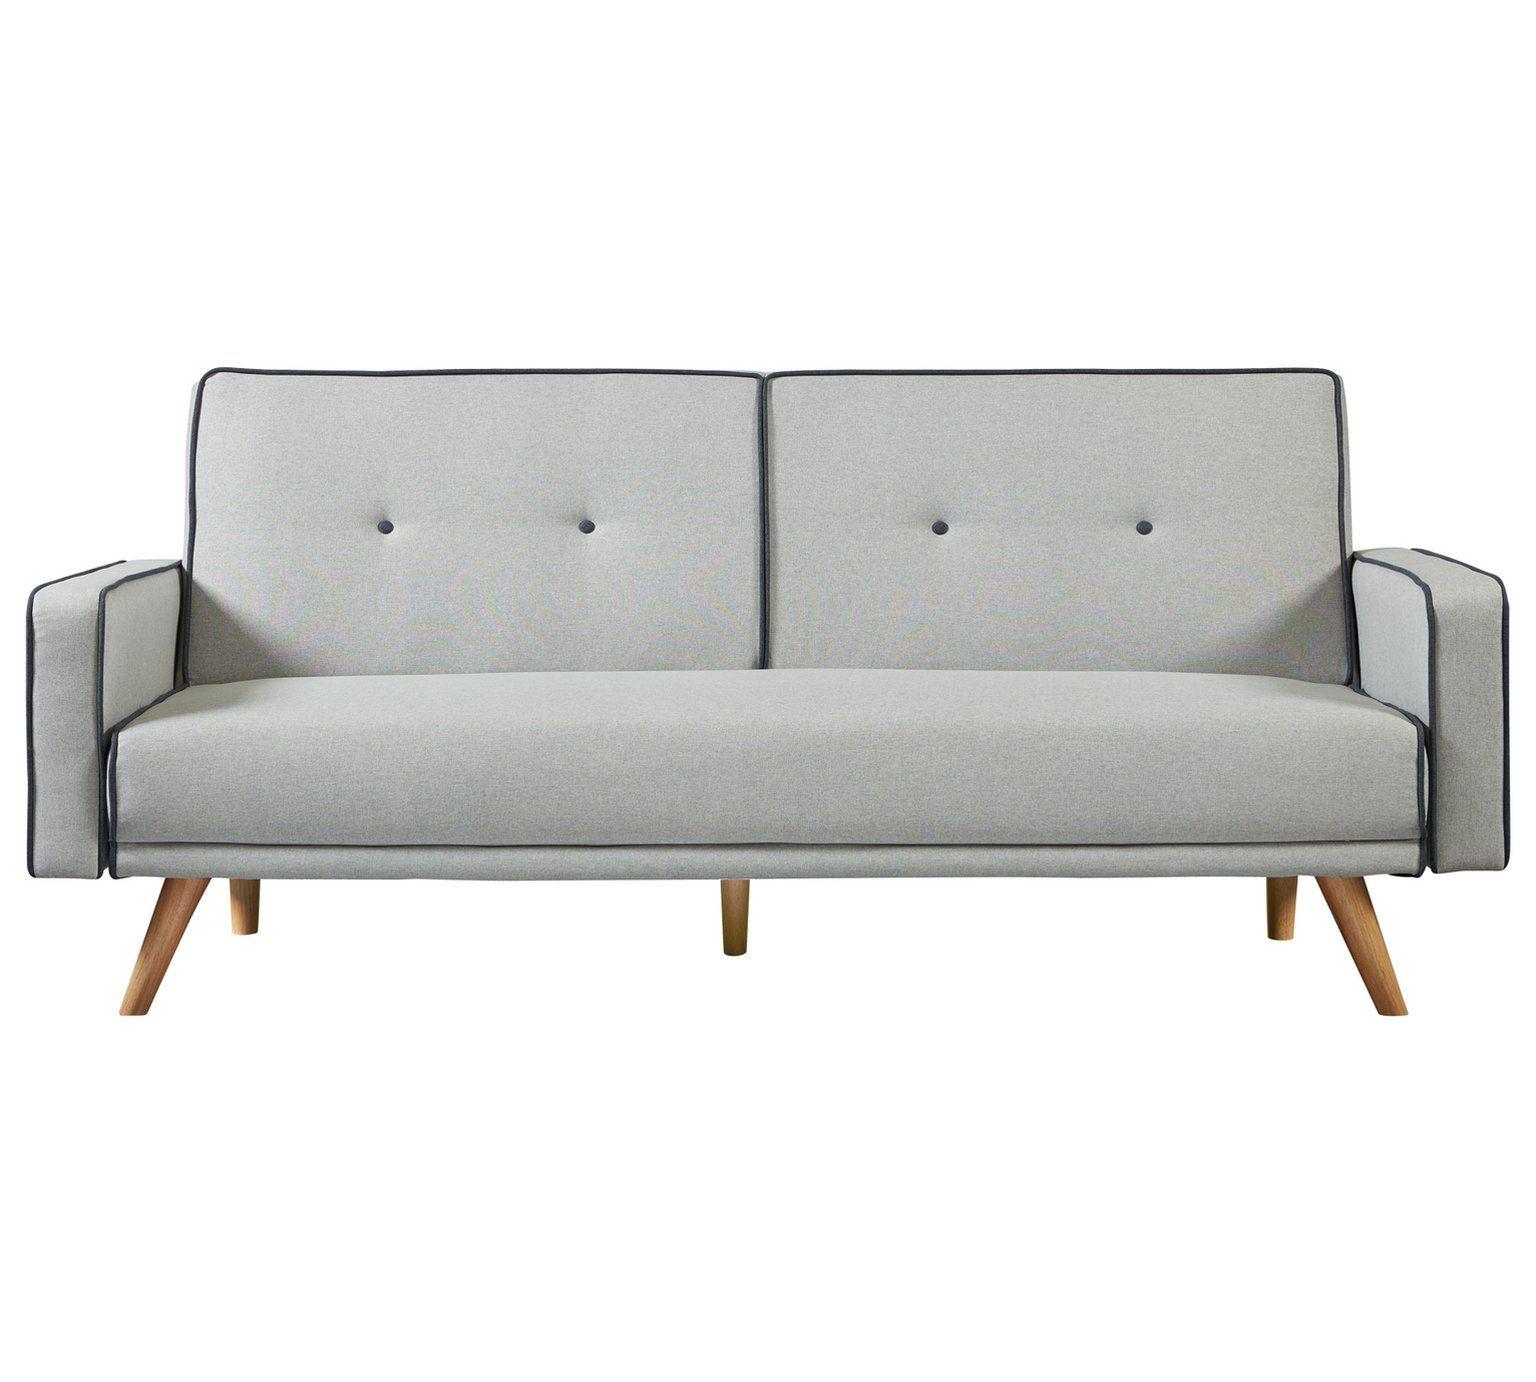 Buy Argos Home Frankie 2 Seater Clic Clac Sofa Bed Grey